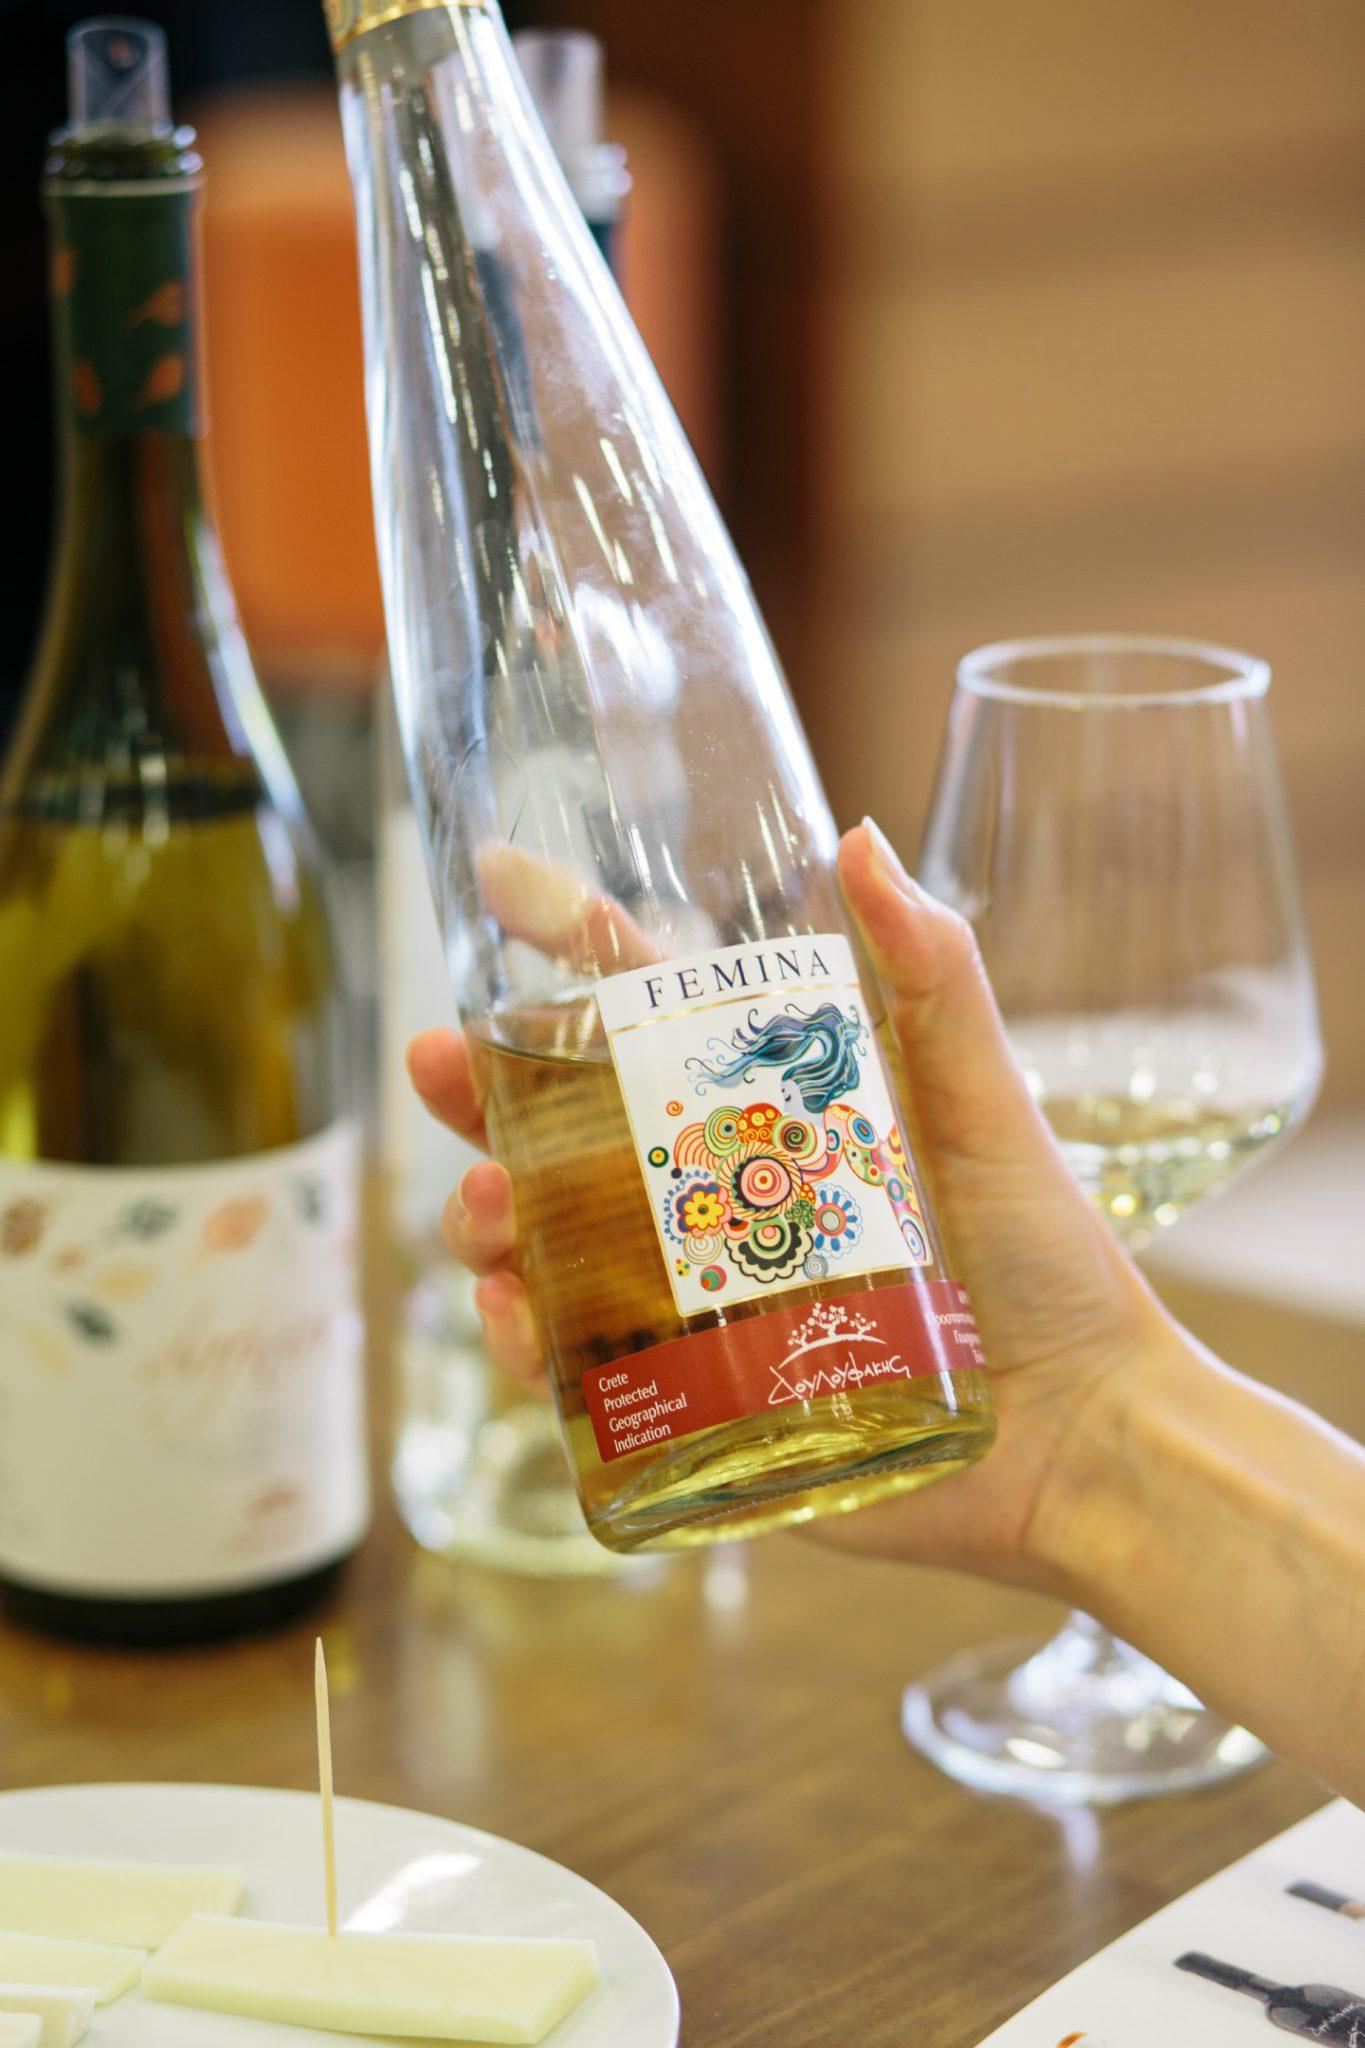 douloufakis-winery-crete-7